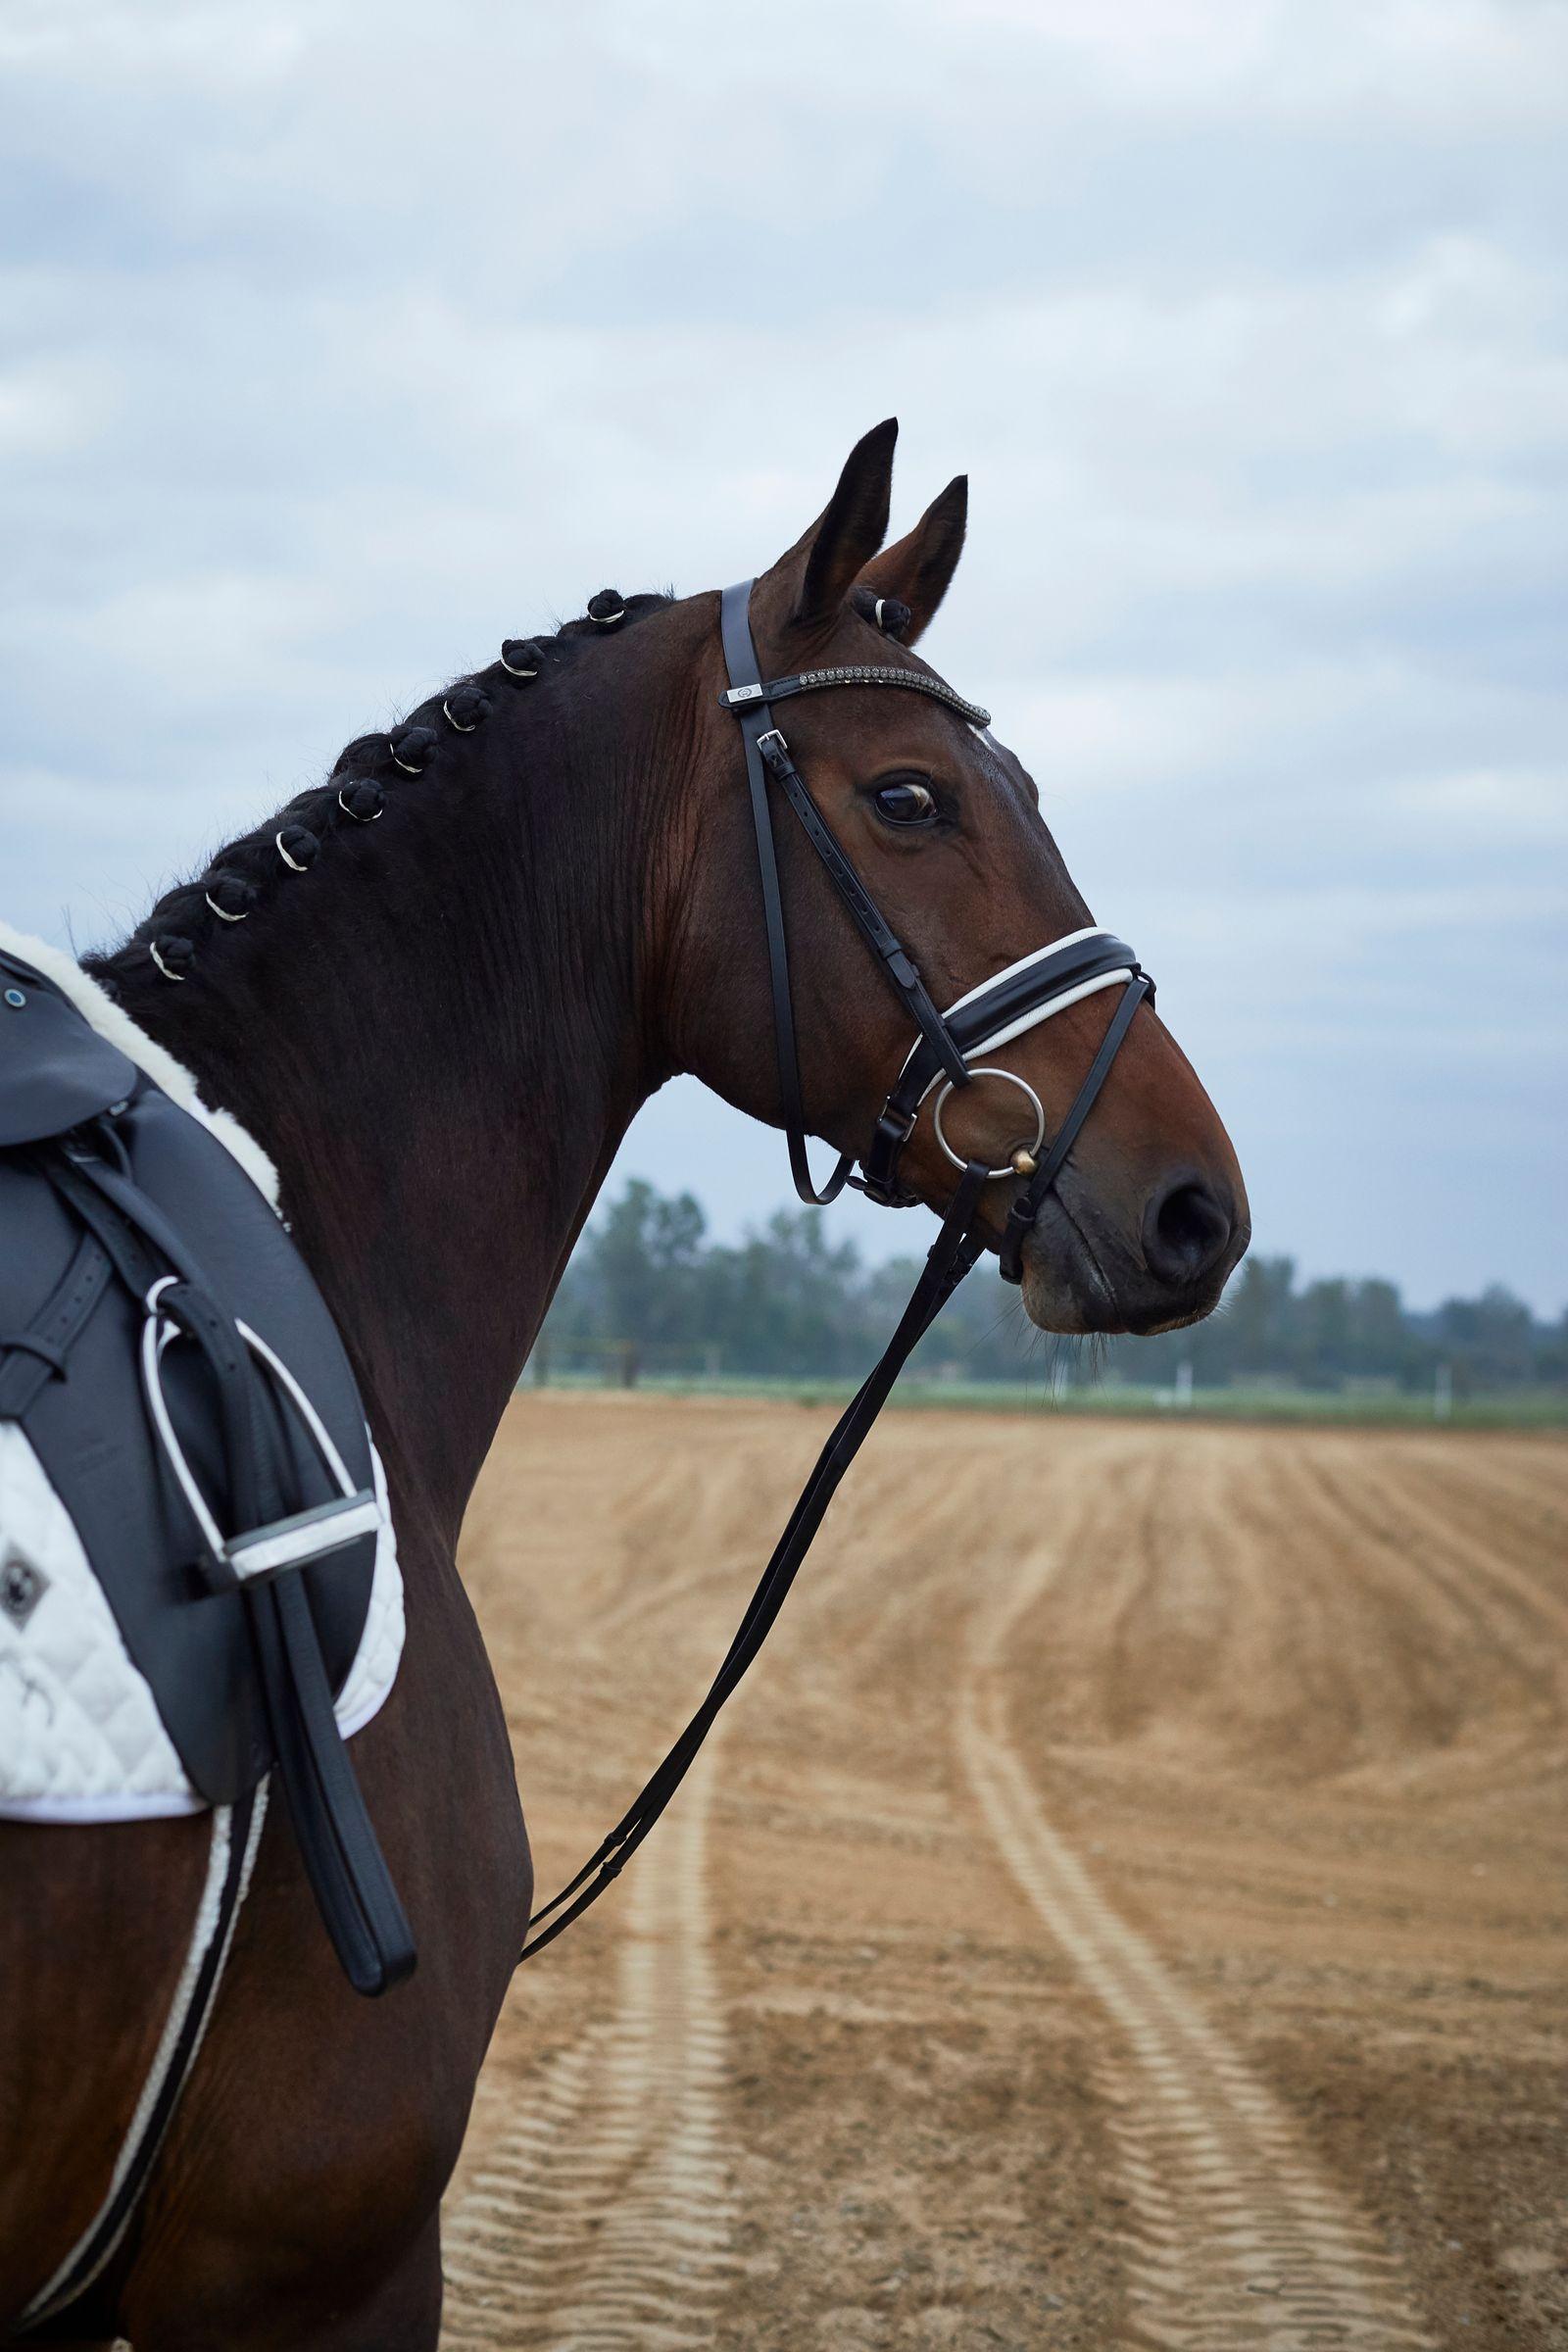 JR_NBH_Dressage_Horse_091318_0072.jpg